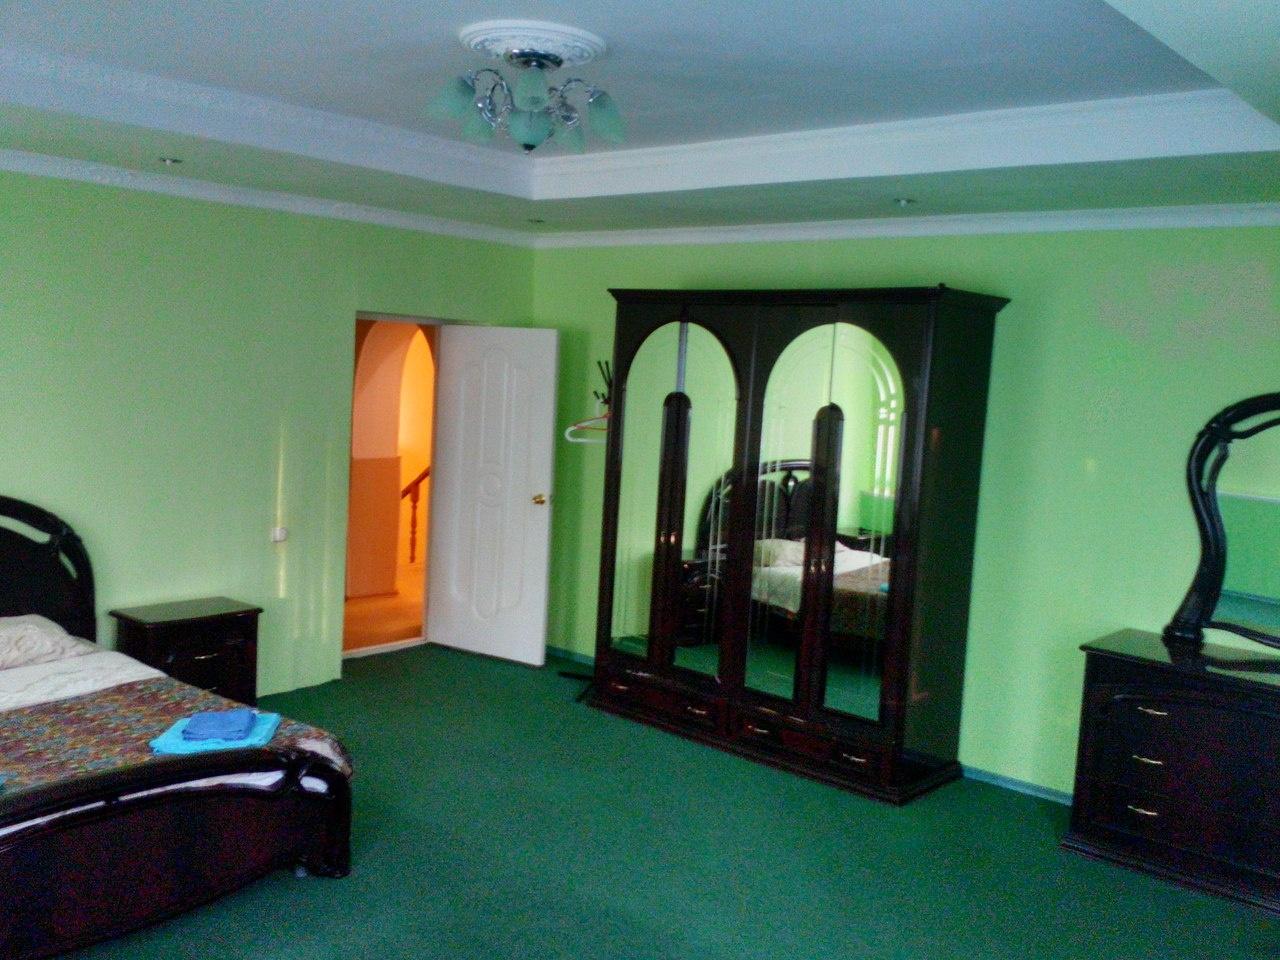 Дом отдыха «Берсут» Республика Татарстан Коттедж, фото 2